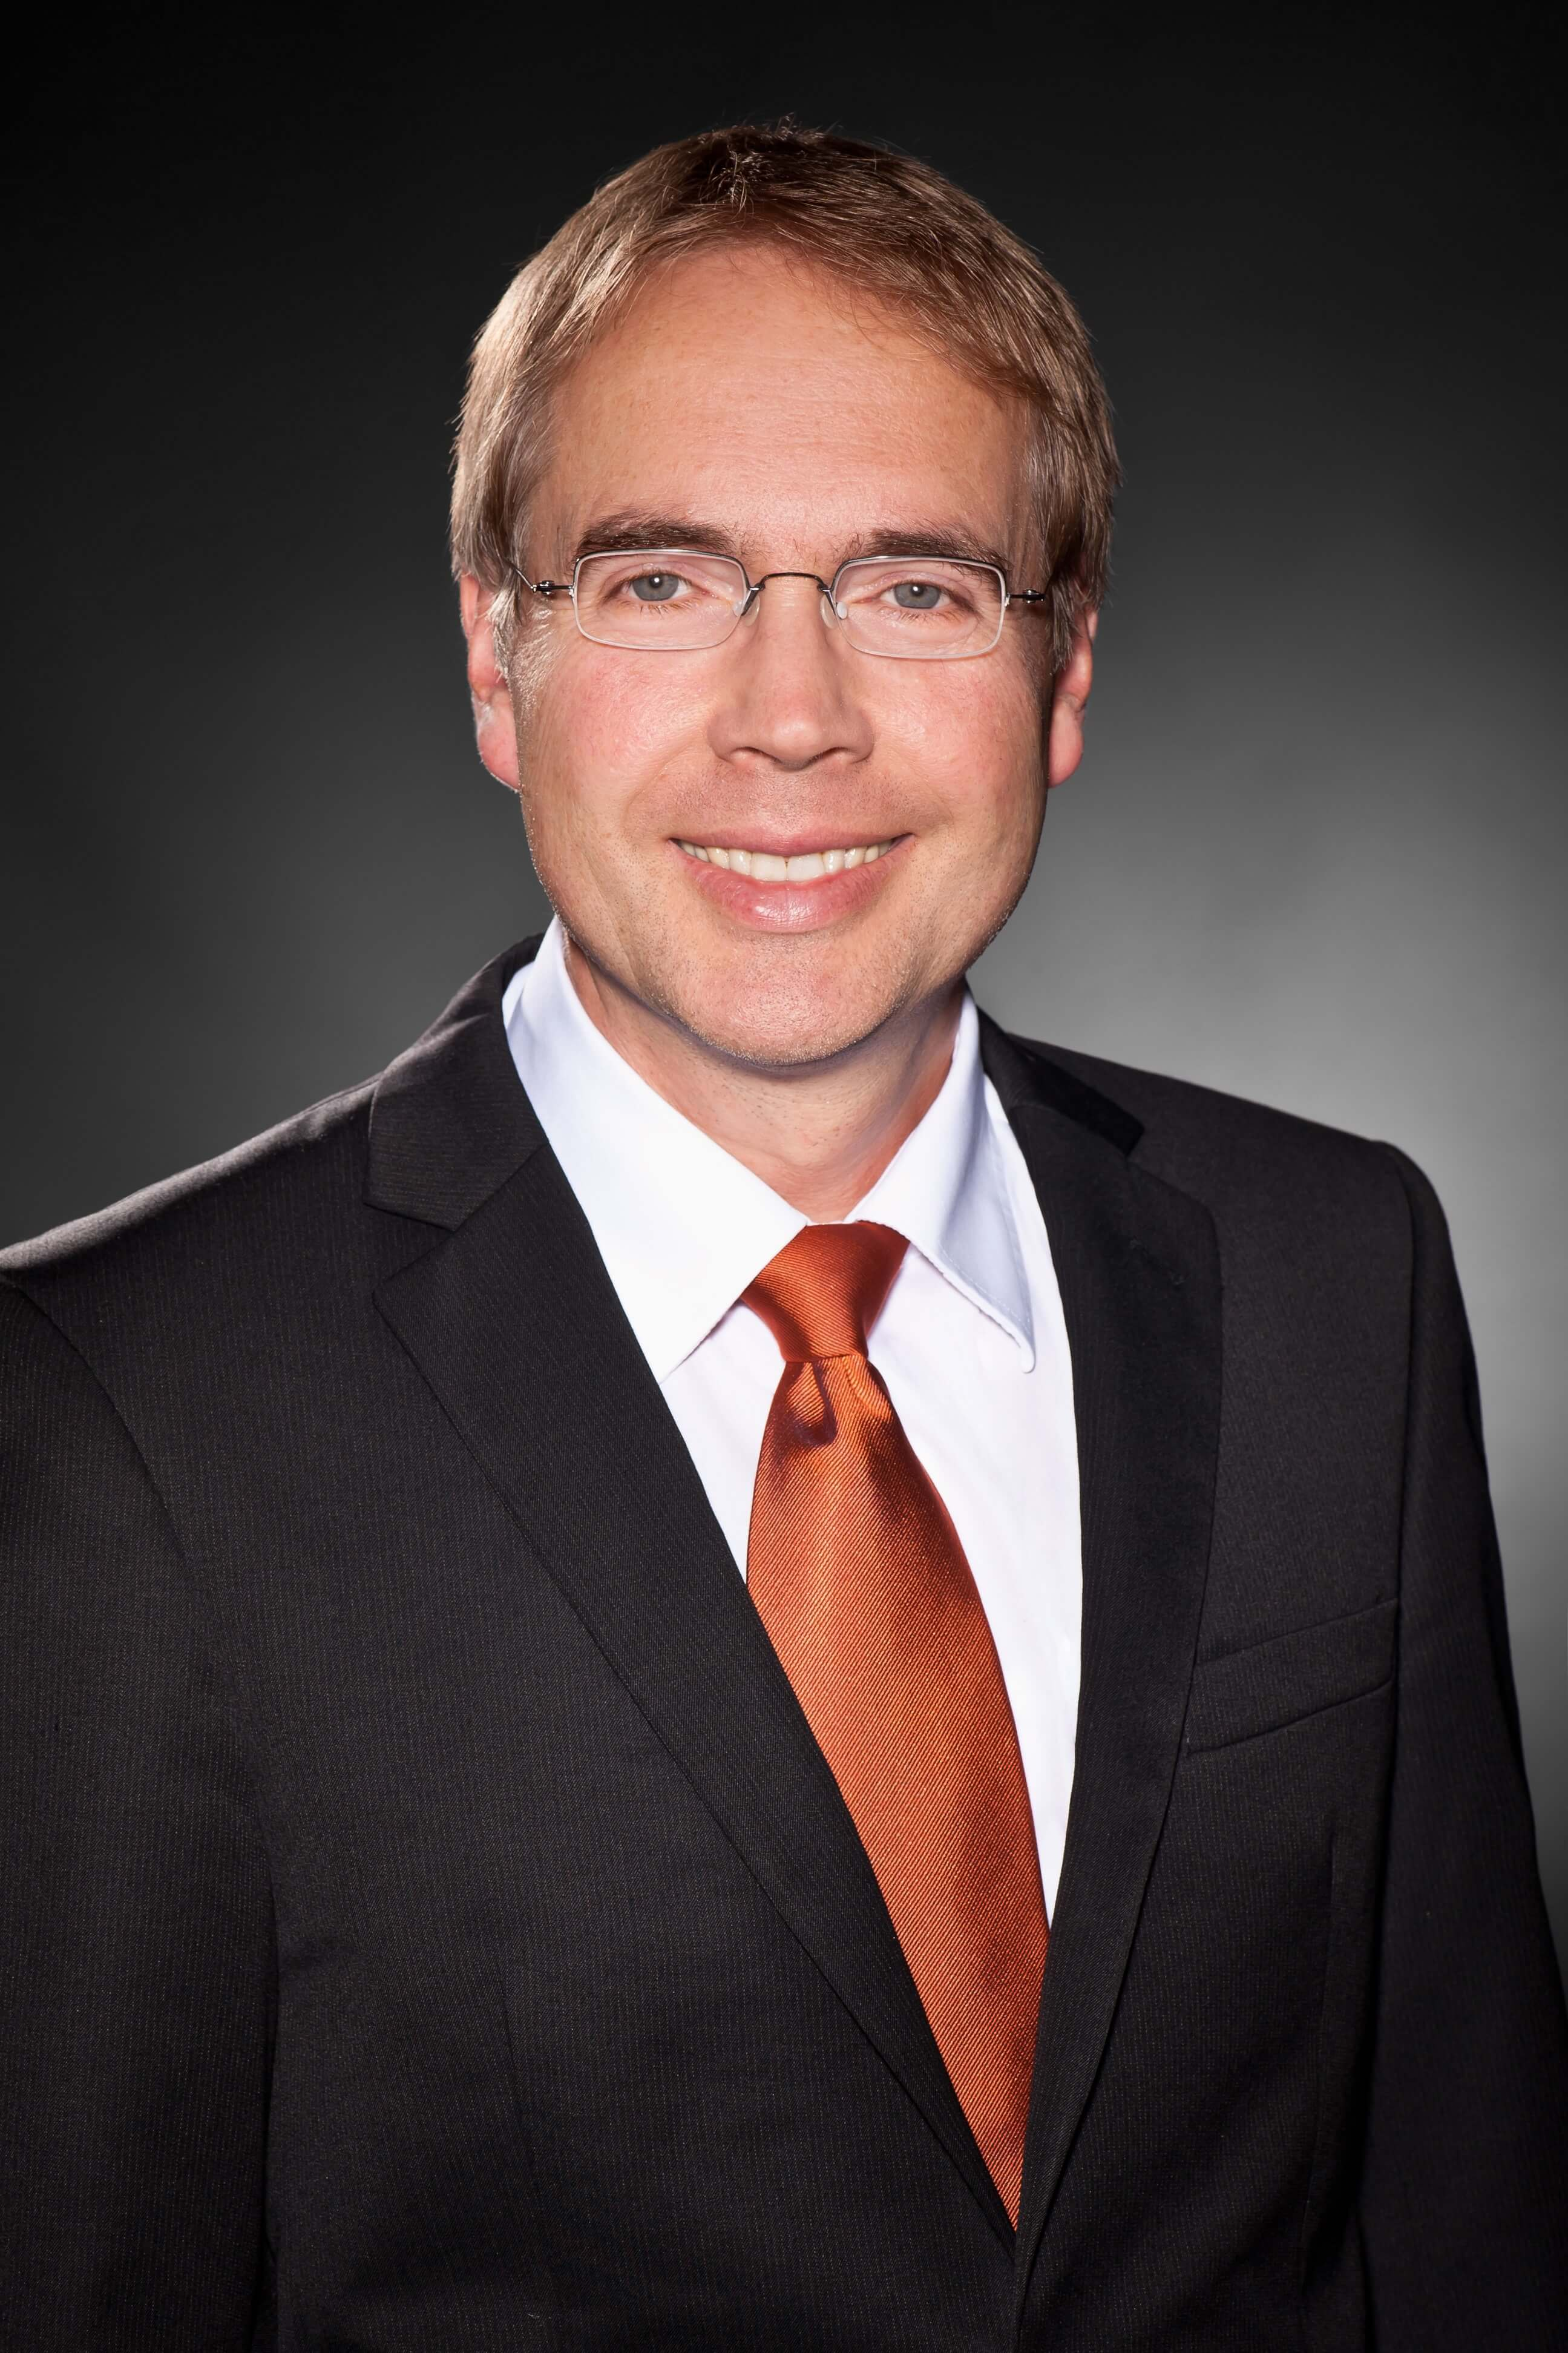 Herbert Koller